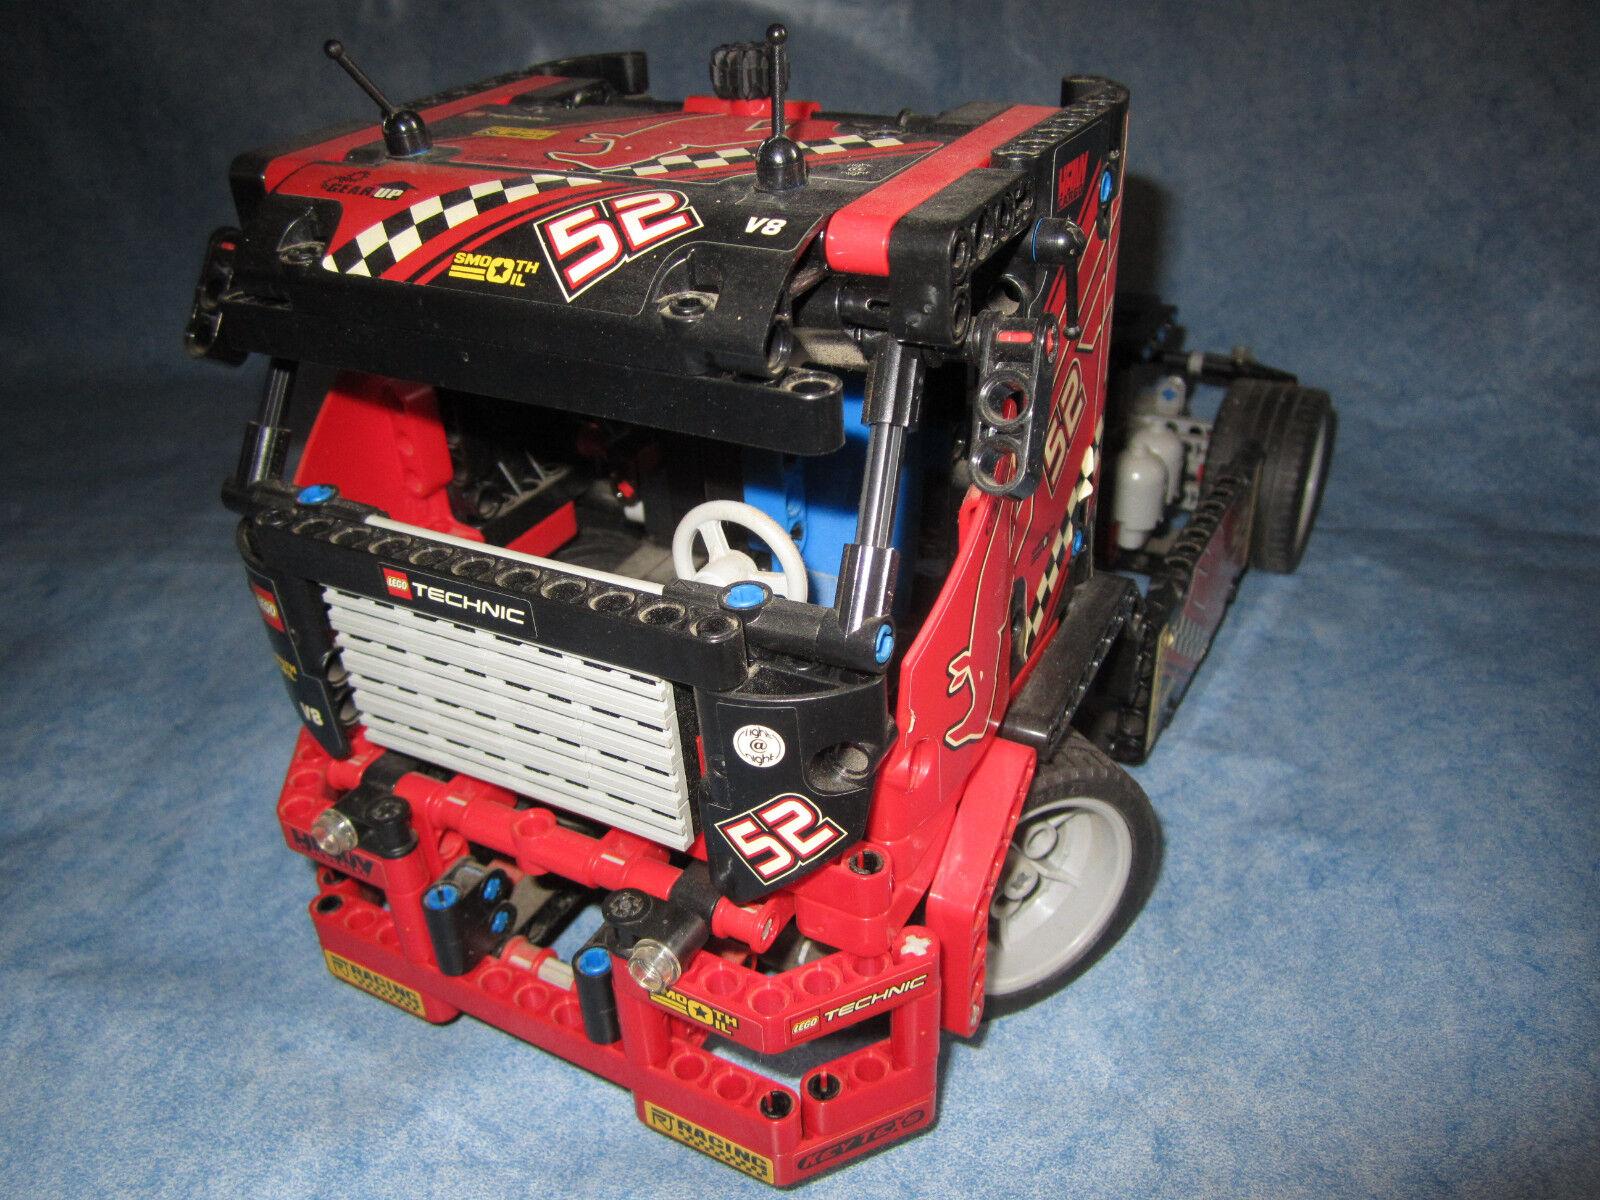 Lego Technic 42041 RACING HARD TRUCK Technics